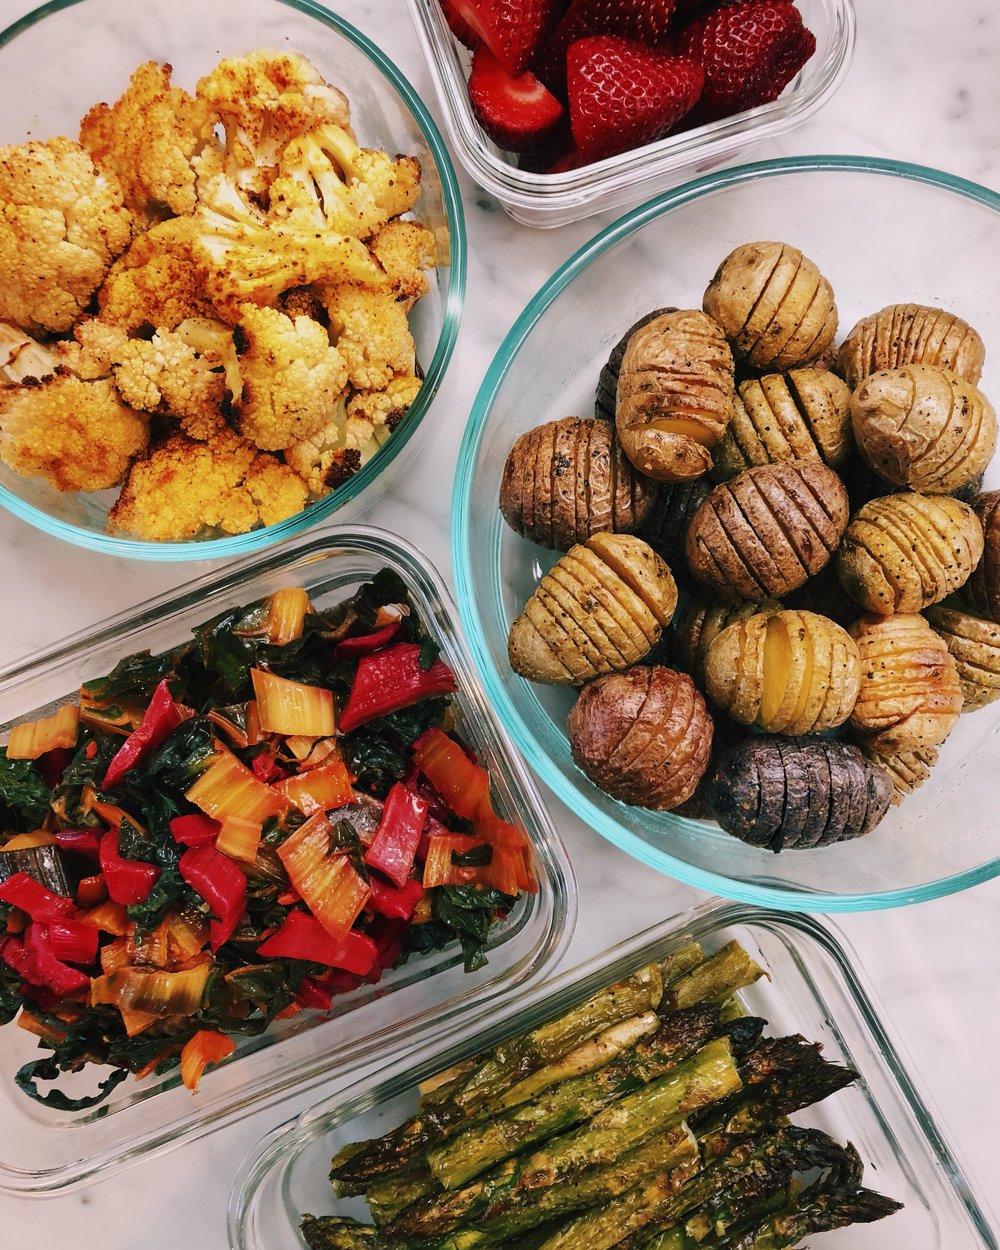 meal prep: the kalejunkie dish